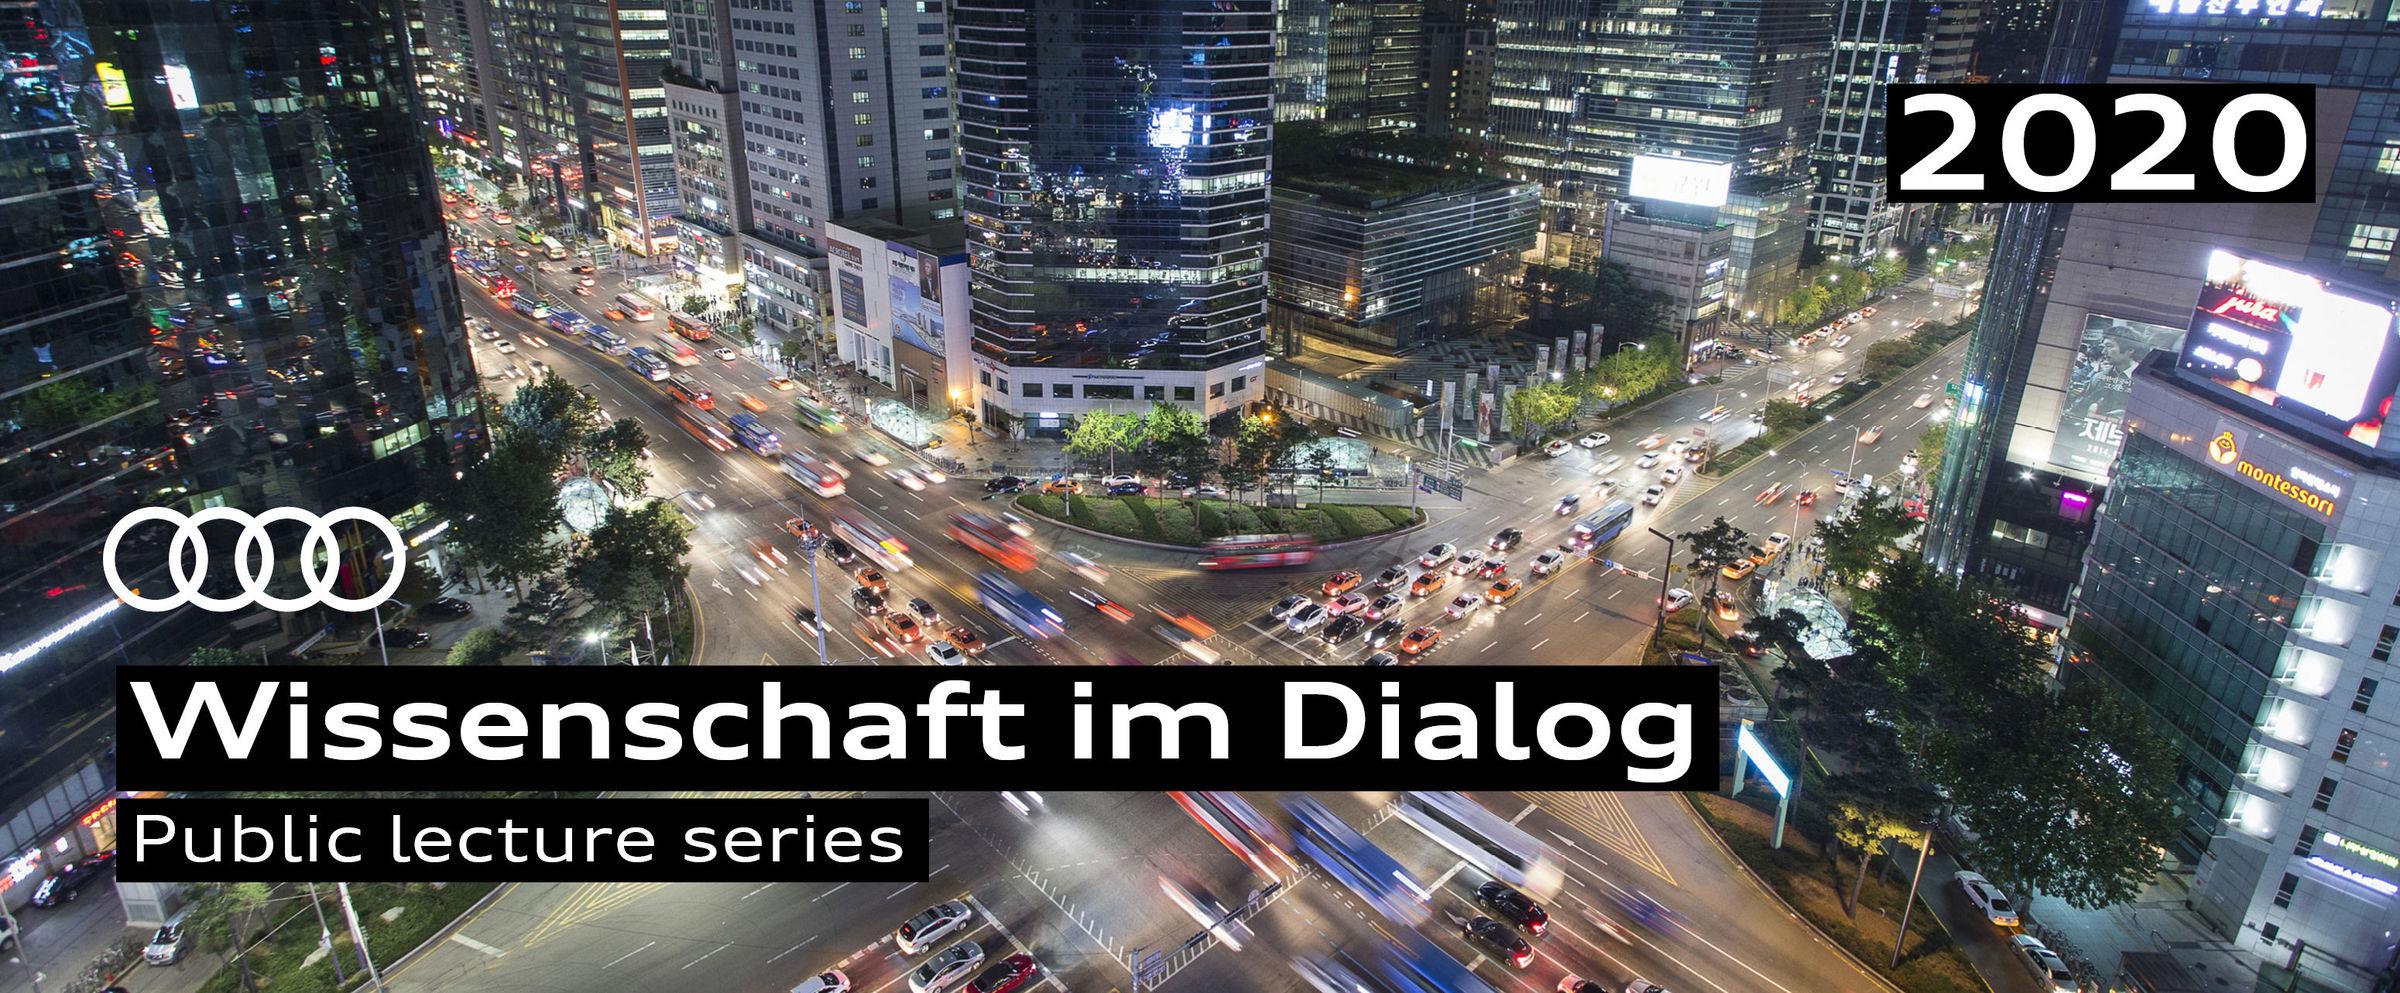 "Audi ""Wissenschaft im Dialog"" 2020 lecture series"